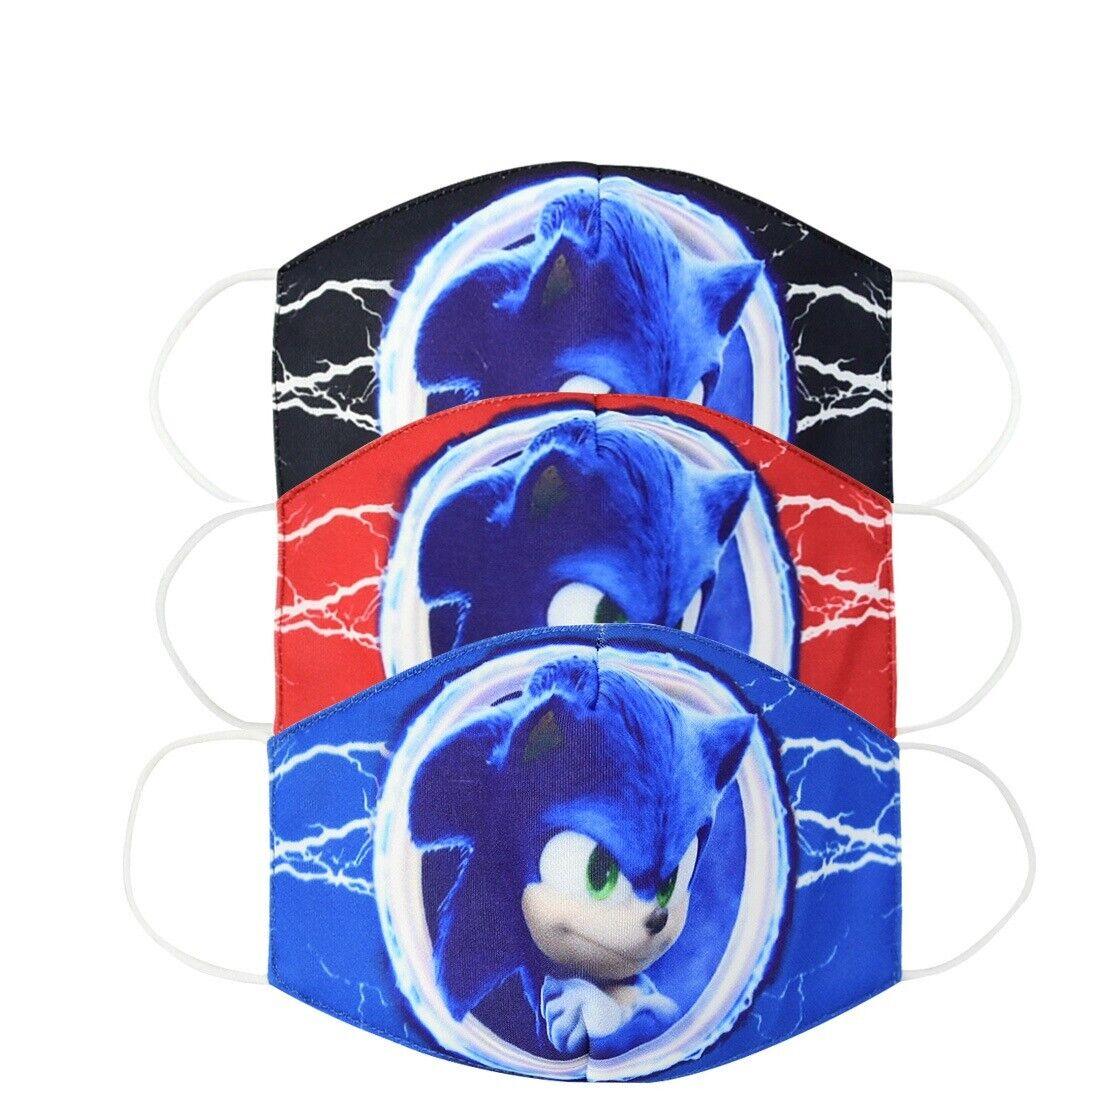 3 Pcs Super Sonic Hedgehog Cartoon Cotton Masks Half Face Mouth Cover Kids Adult Ebay